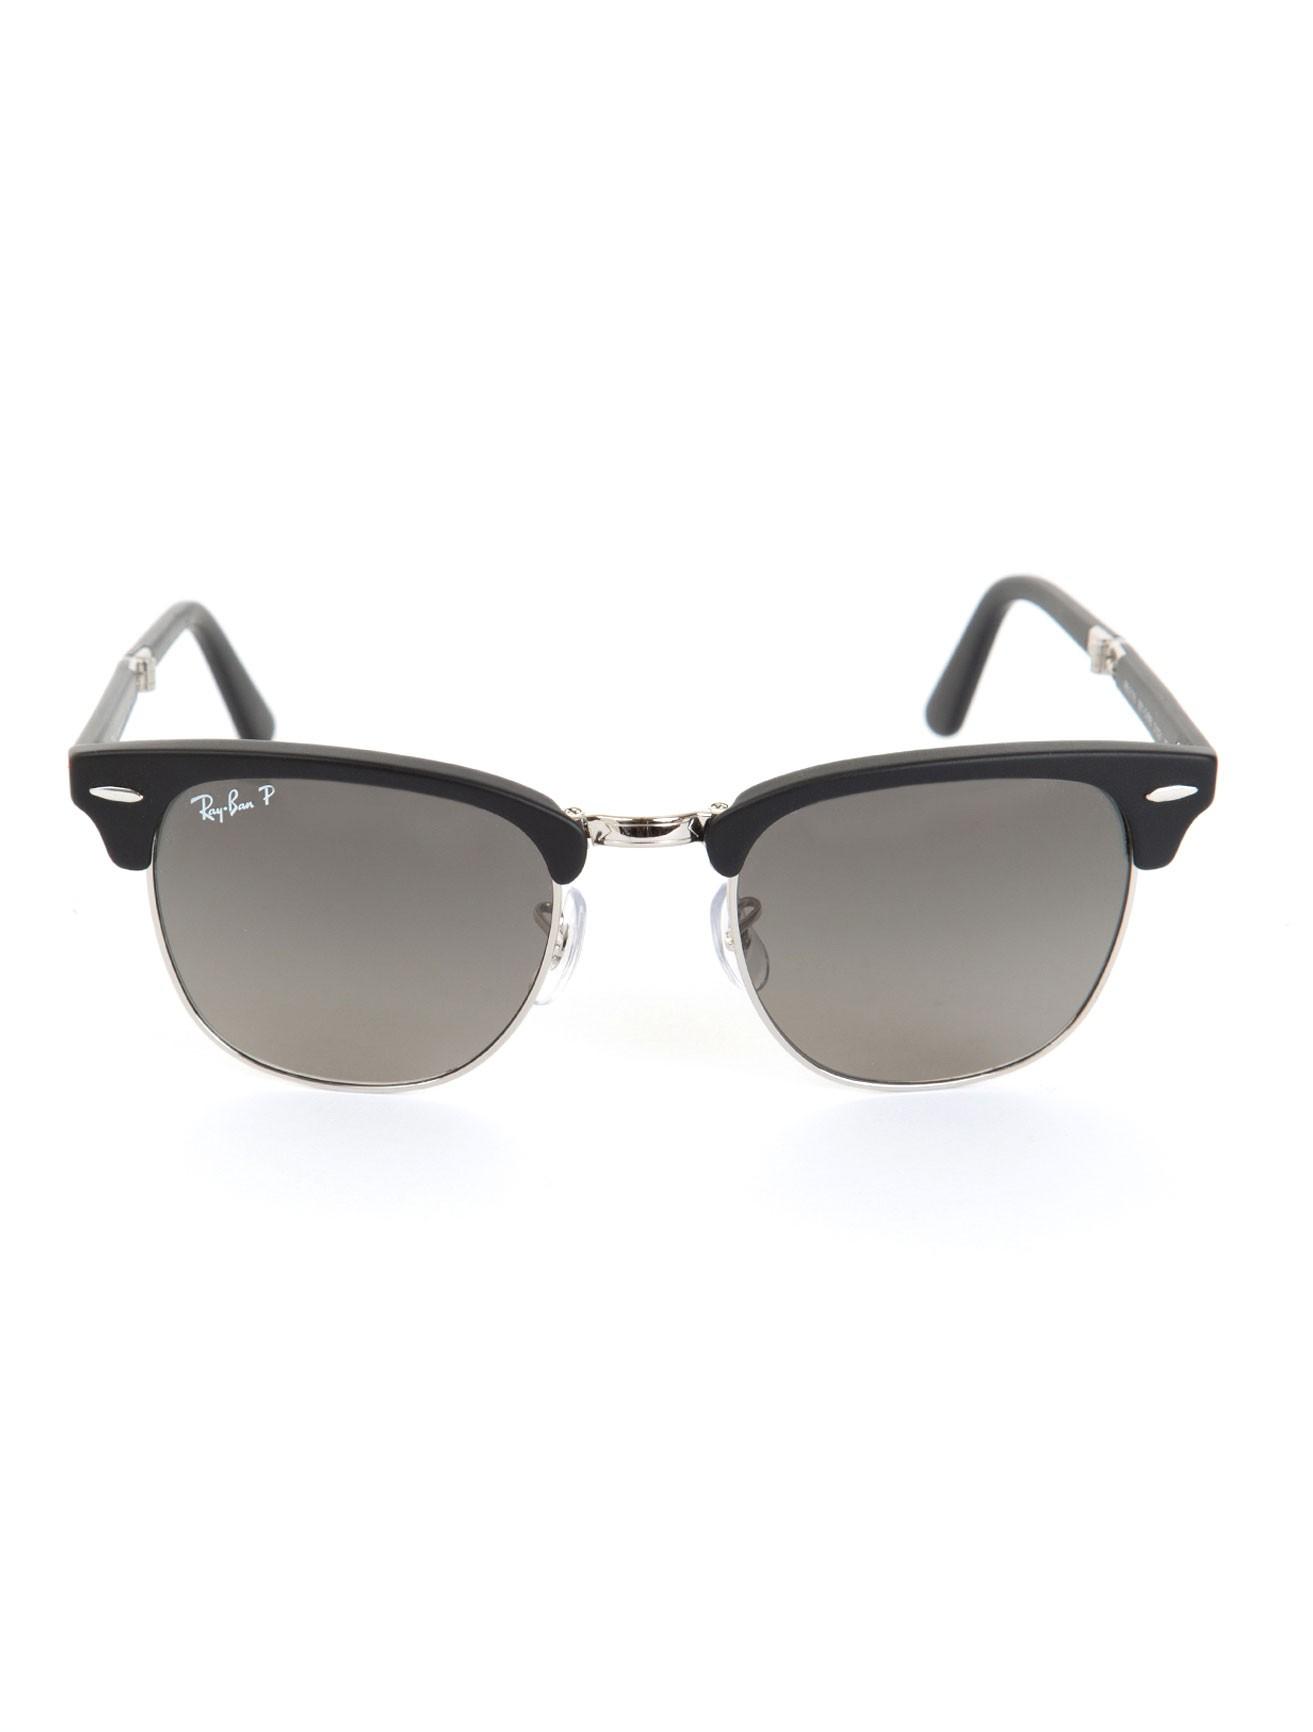 ray ban clubmaster matte black sunglasses in black for men. Black Bedroom Furniture Sets. Home Design Ideas